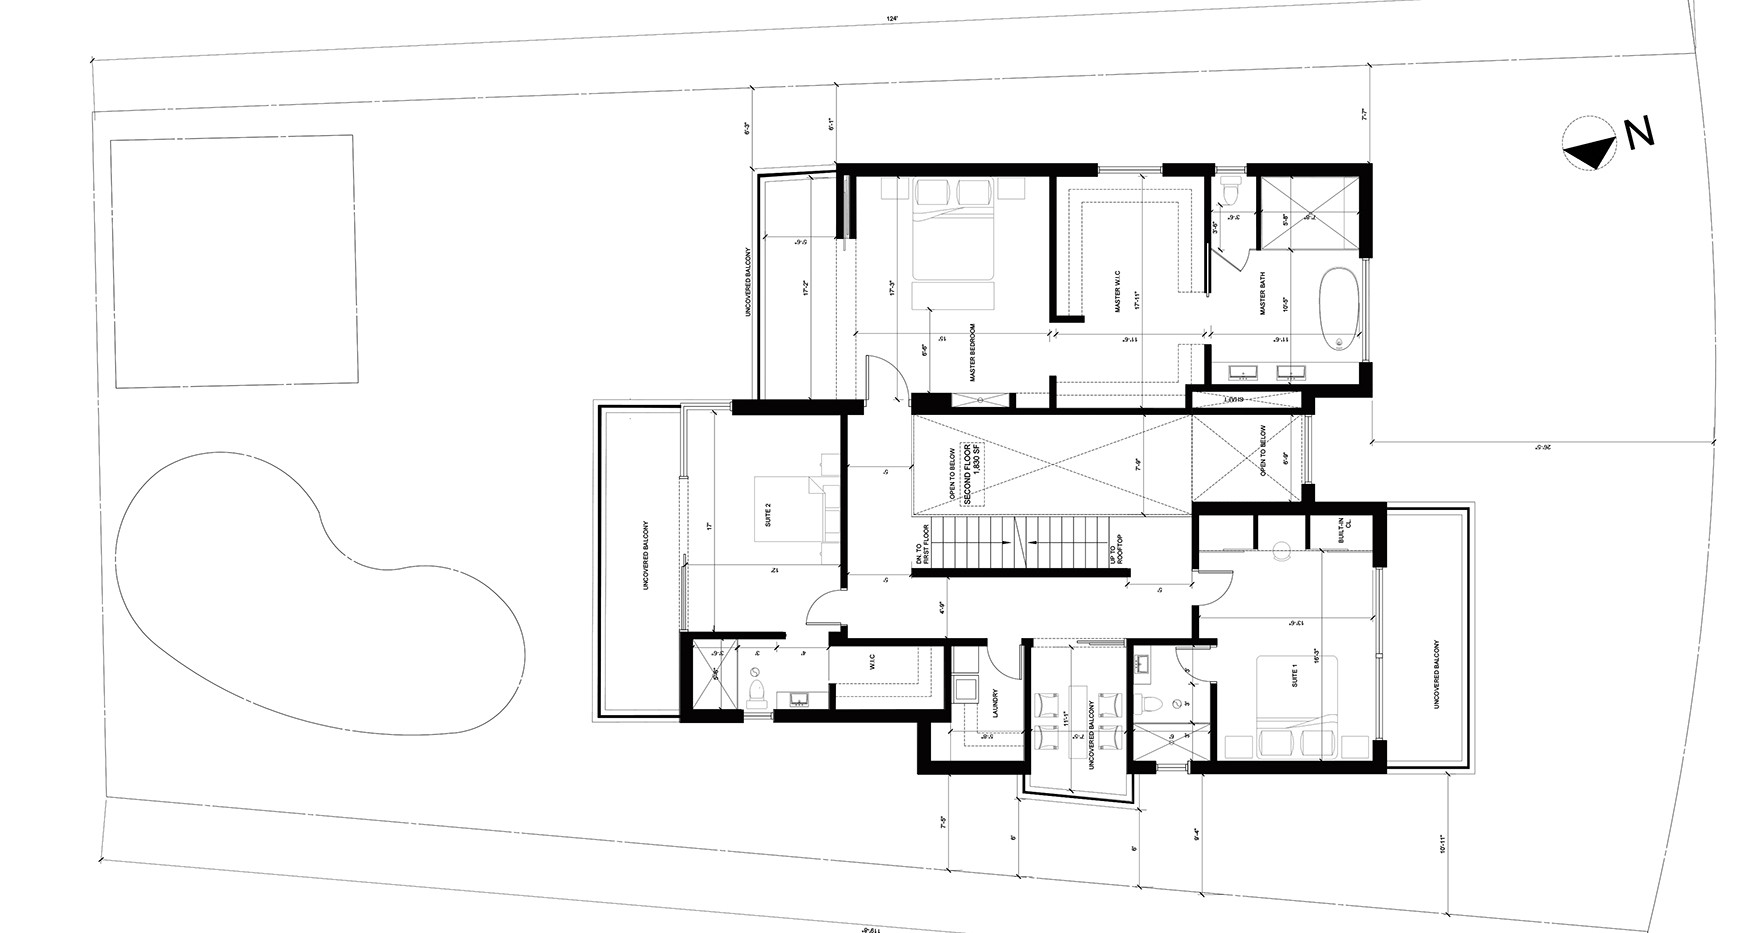 Conceptual Second Floor